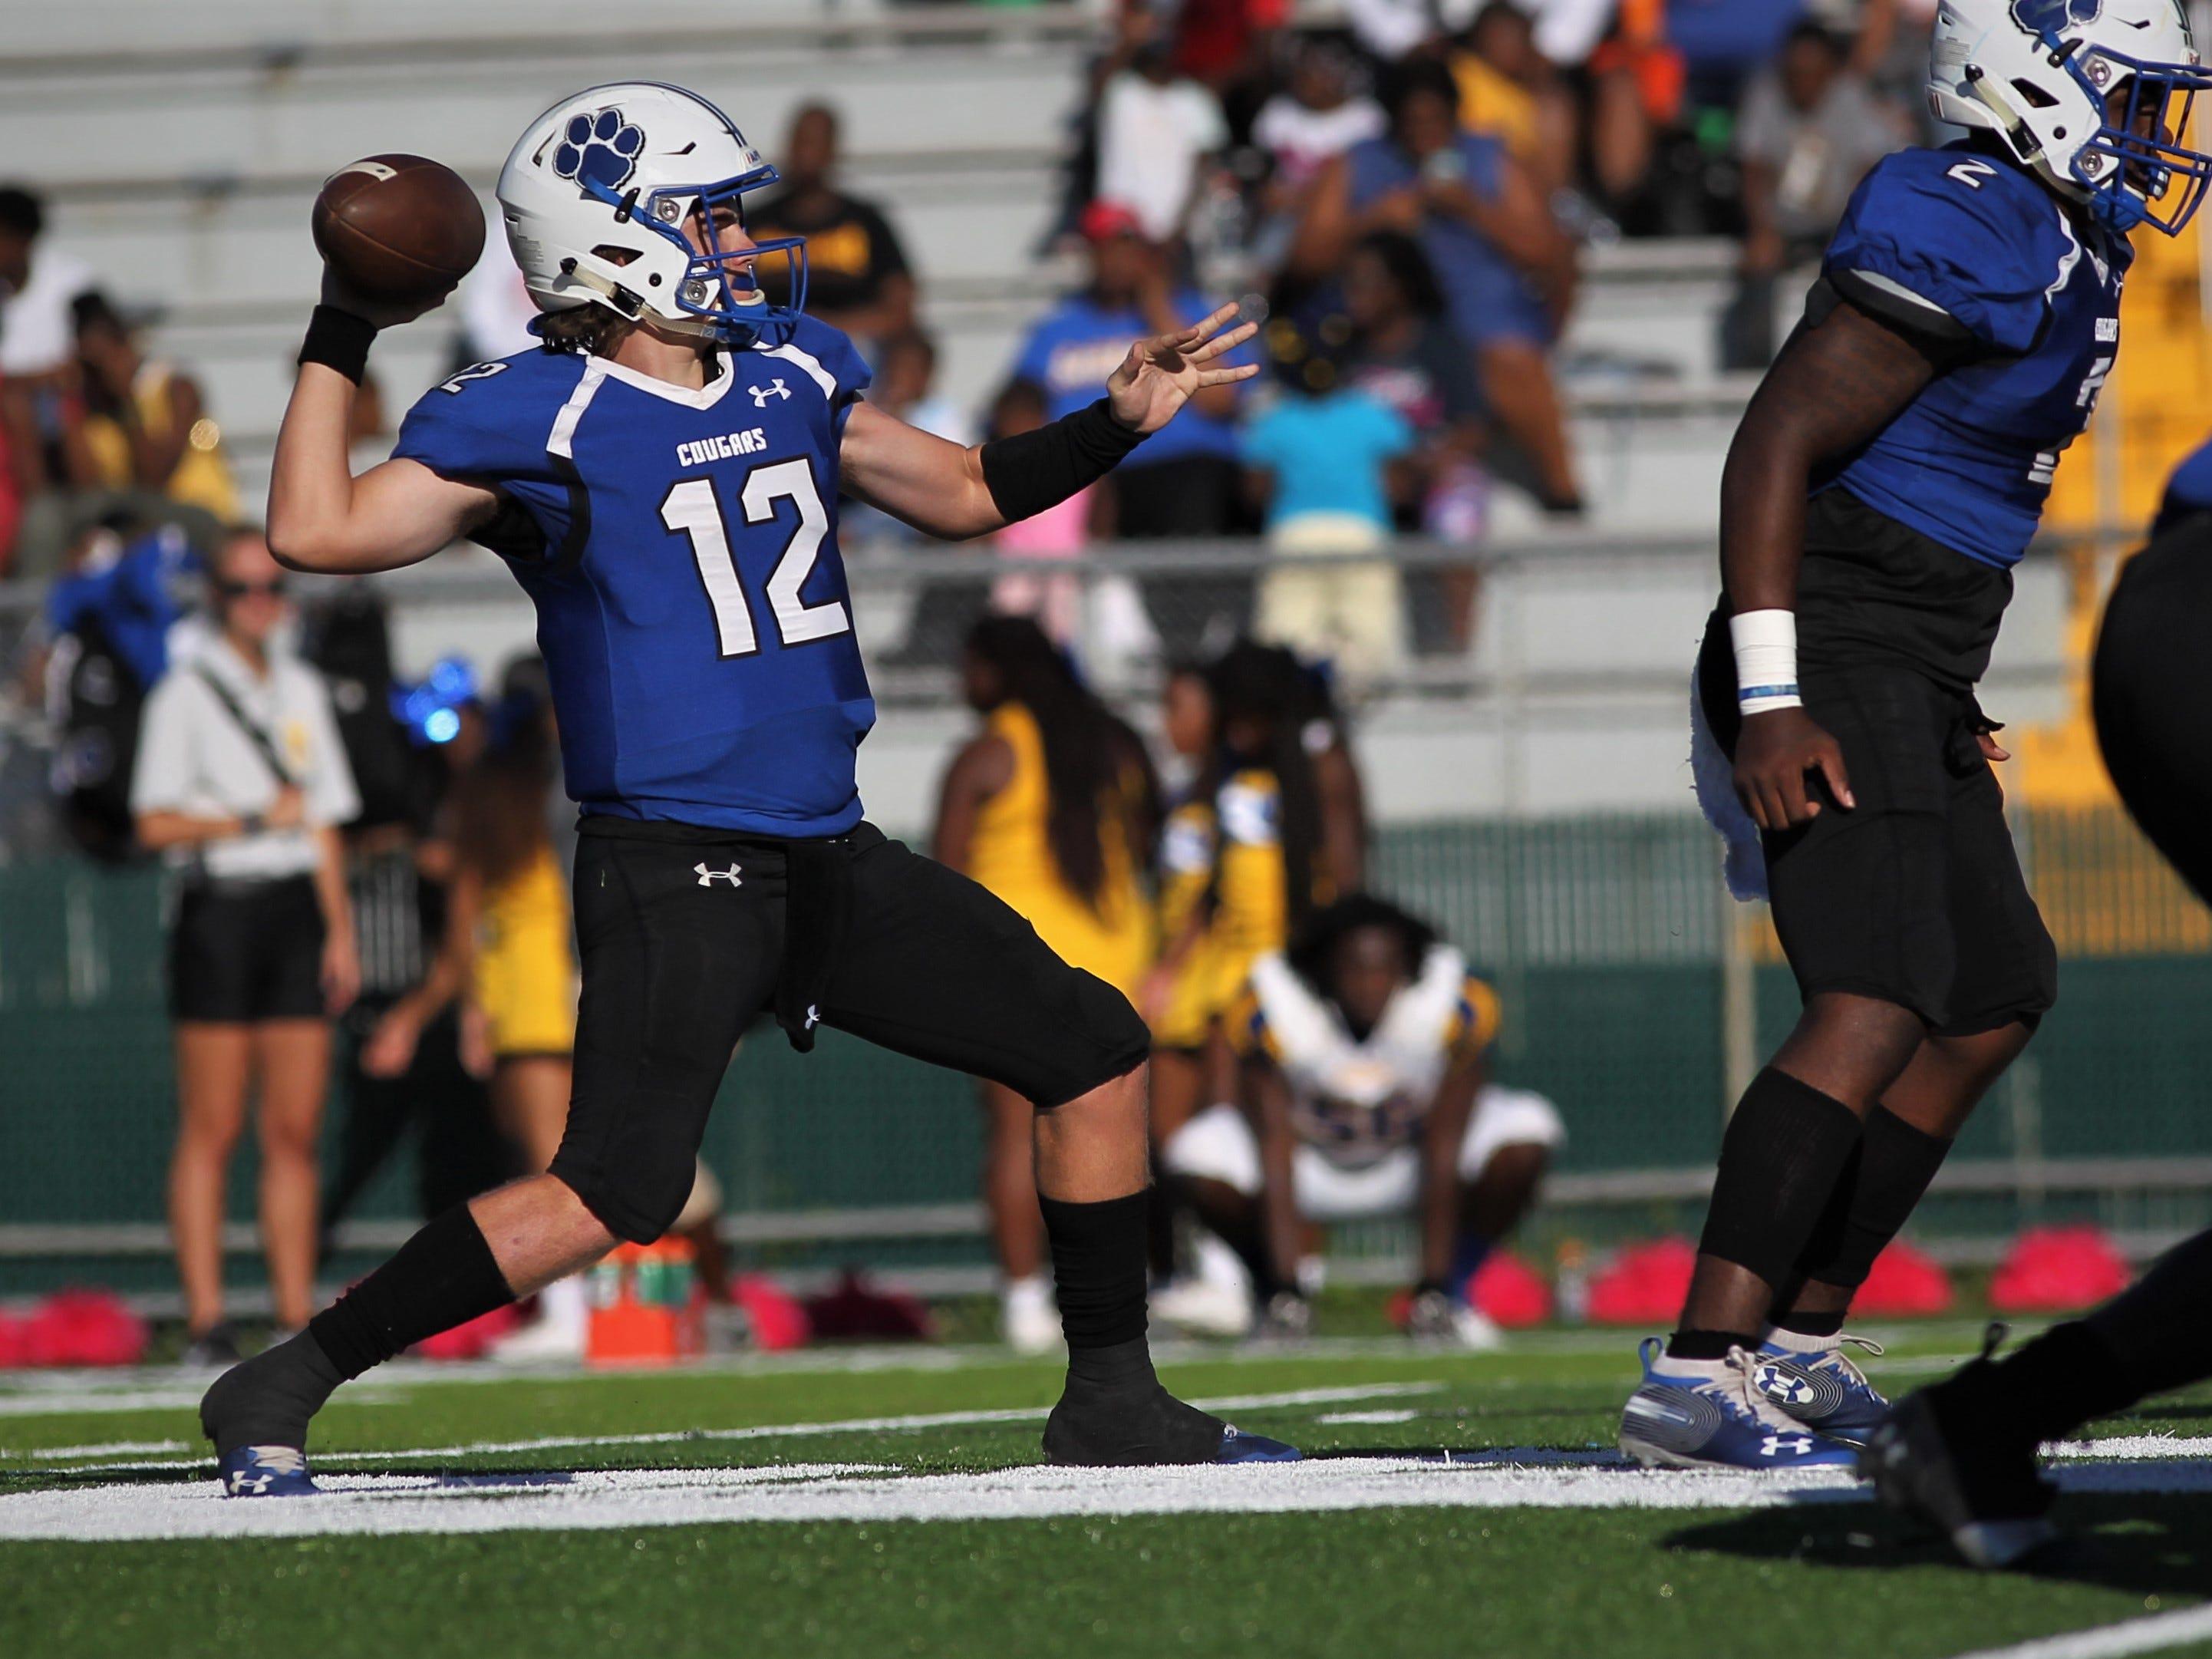 Godby quarterback Trey Fisher throws a deep pass against Rickards.